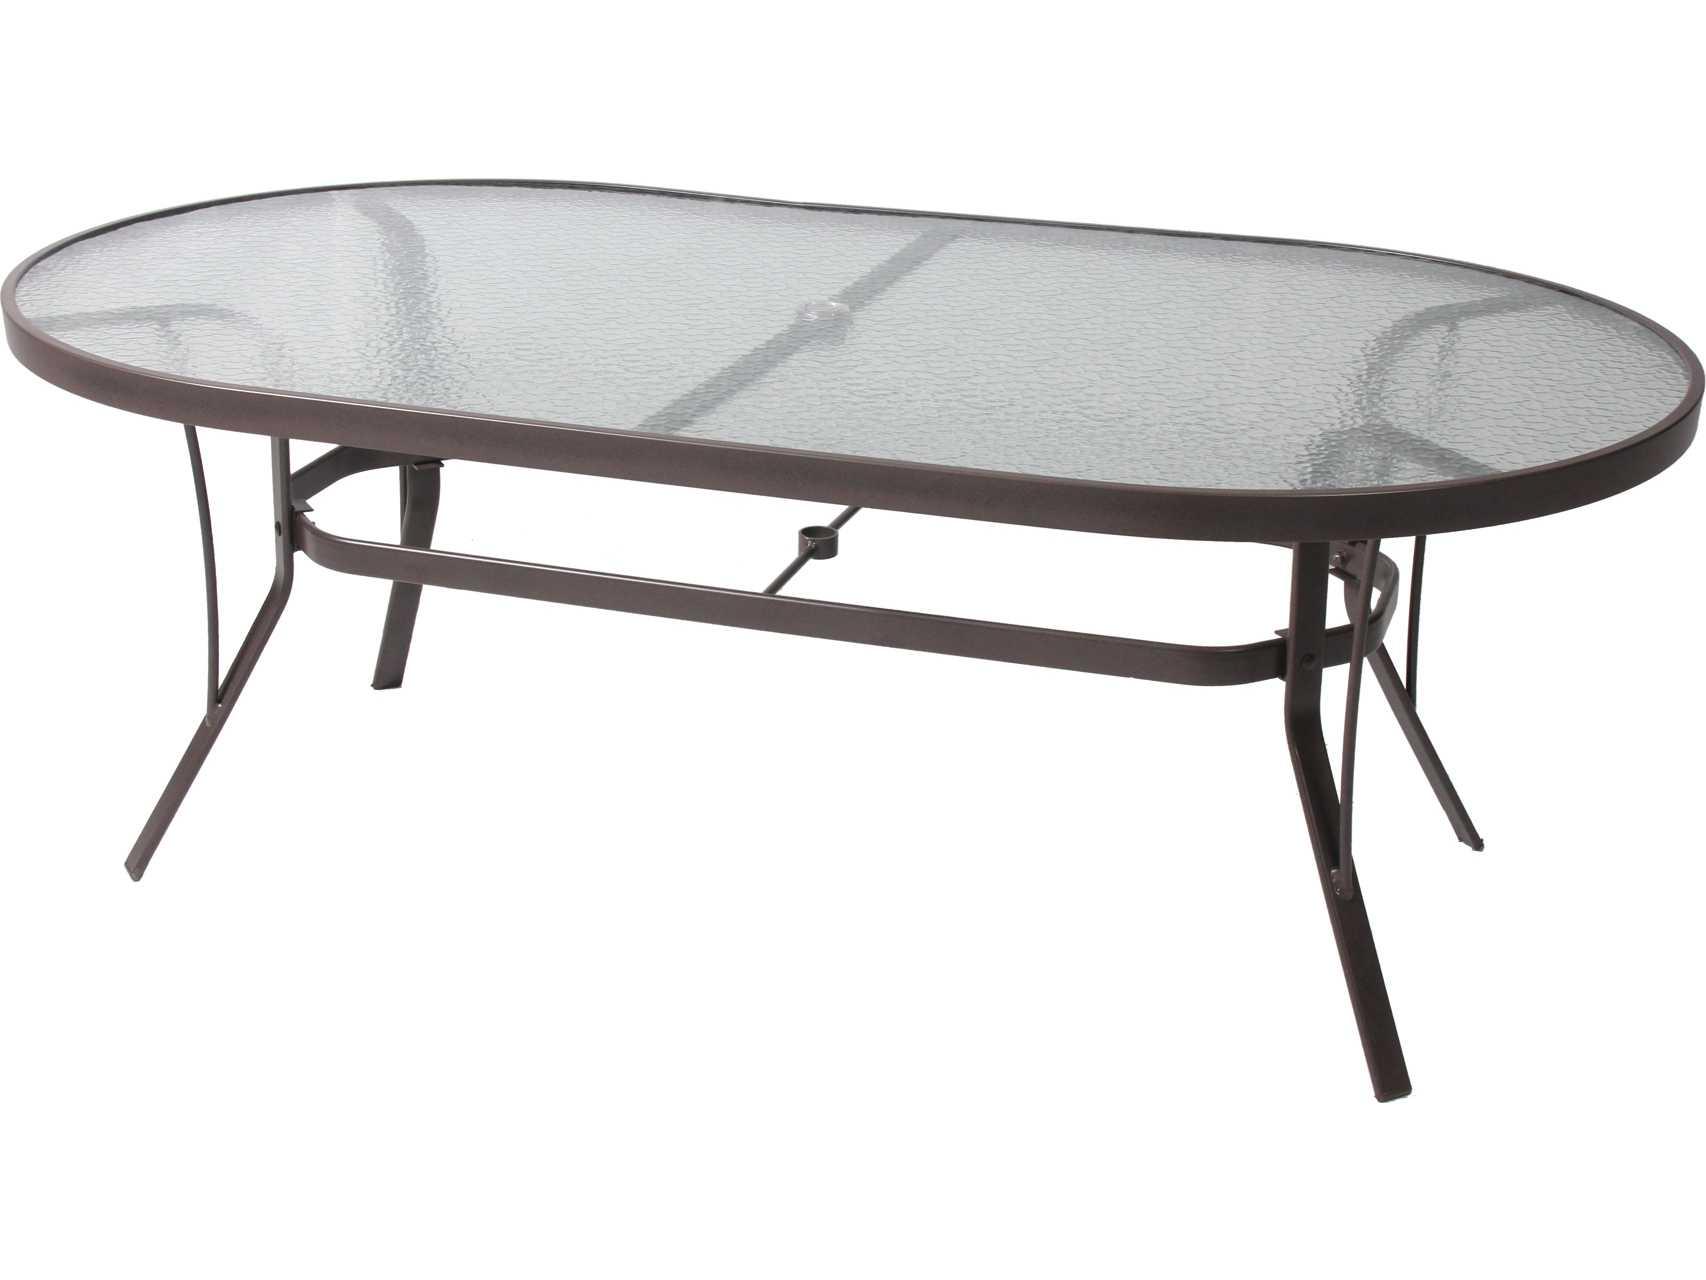 suncoast cast aluminum 76 x 42 oval glass top dining table